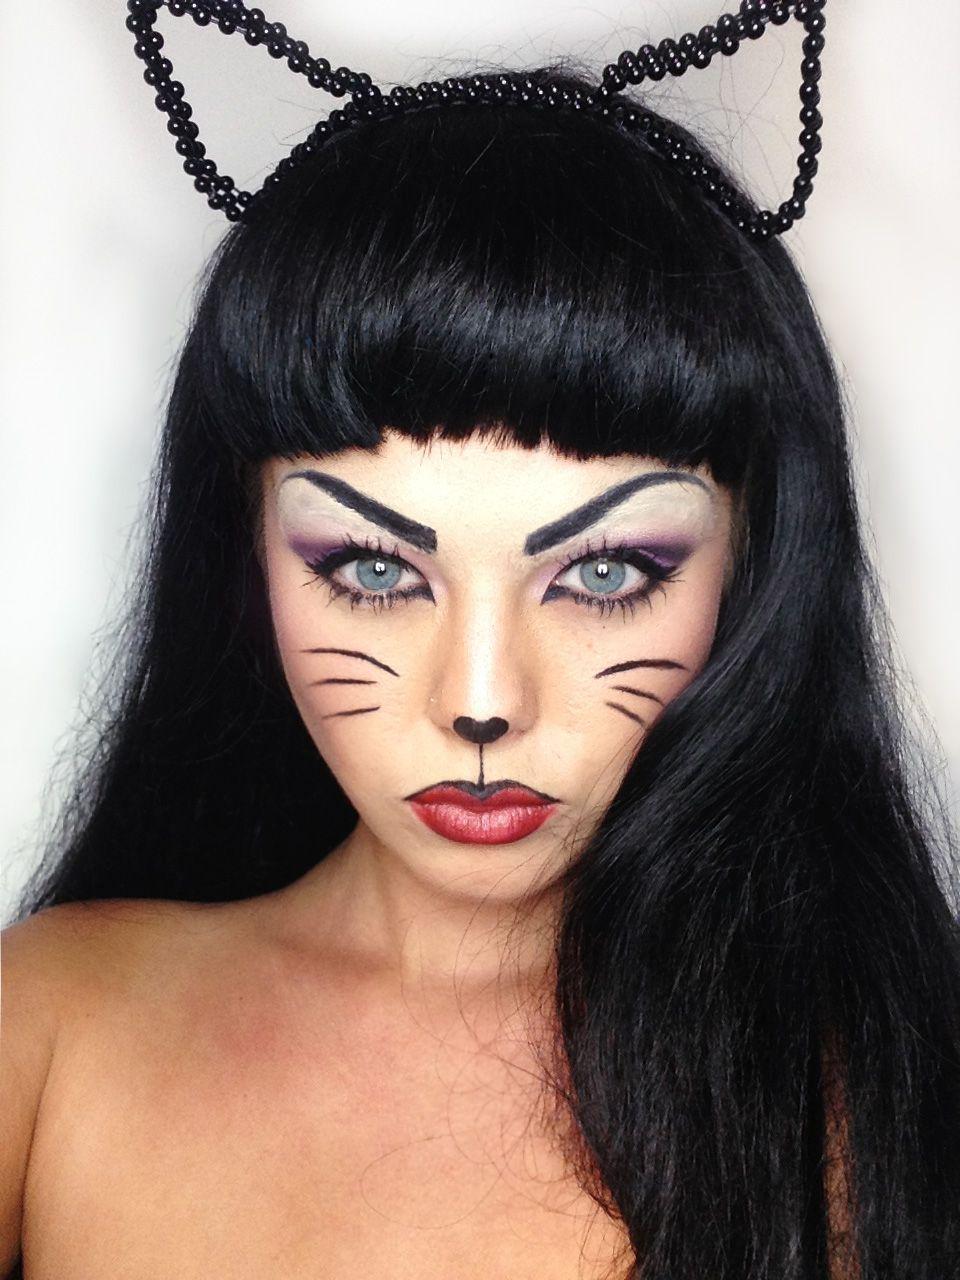 Mia.  My cat makeup for halloween  Twitter- @miakennington Instagram - MiaKenn http://mia0k.tumblr.com